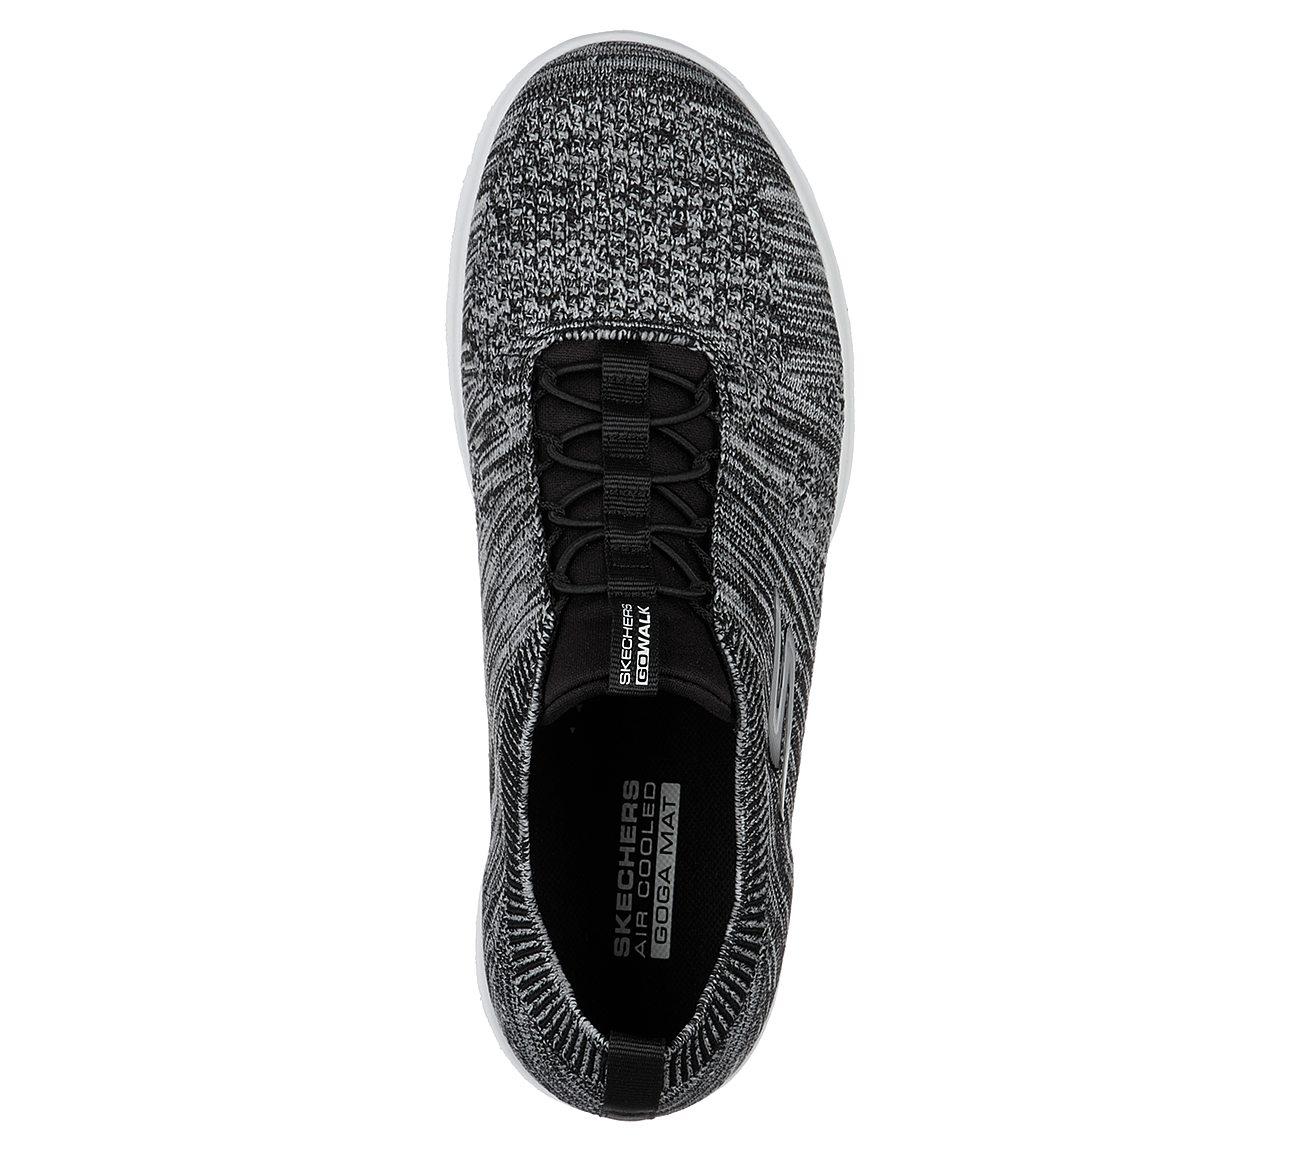 Skechers Go Walk Lite Dawn Womens Walking Shoes